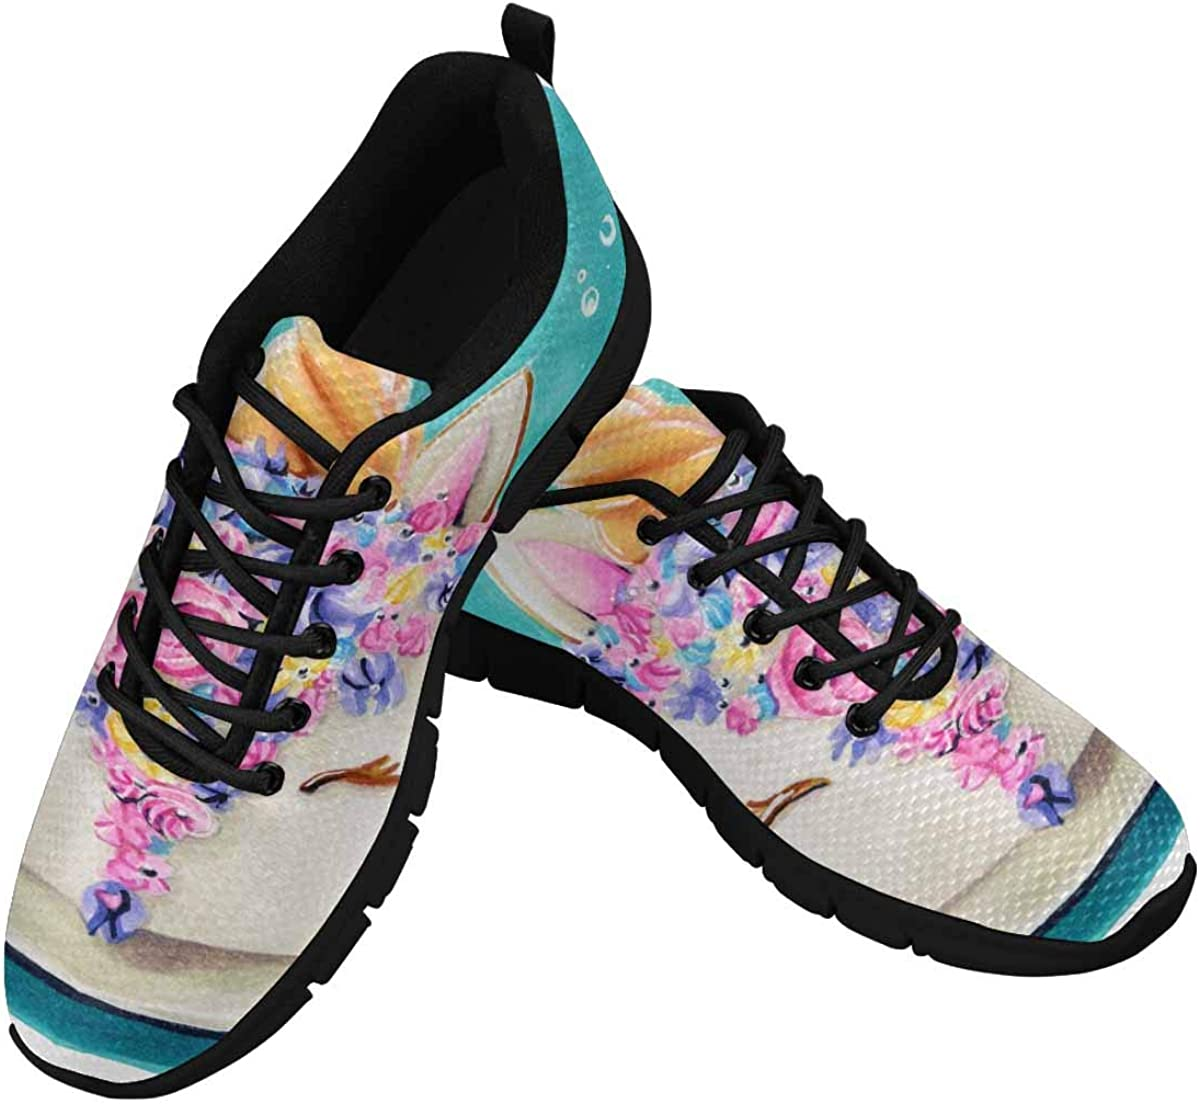 InterestPrint Unicorn Cake Women's Tennis Running Shoes Lightweight Sneakers